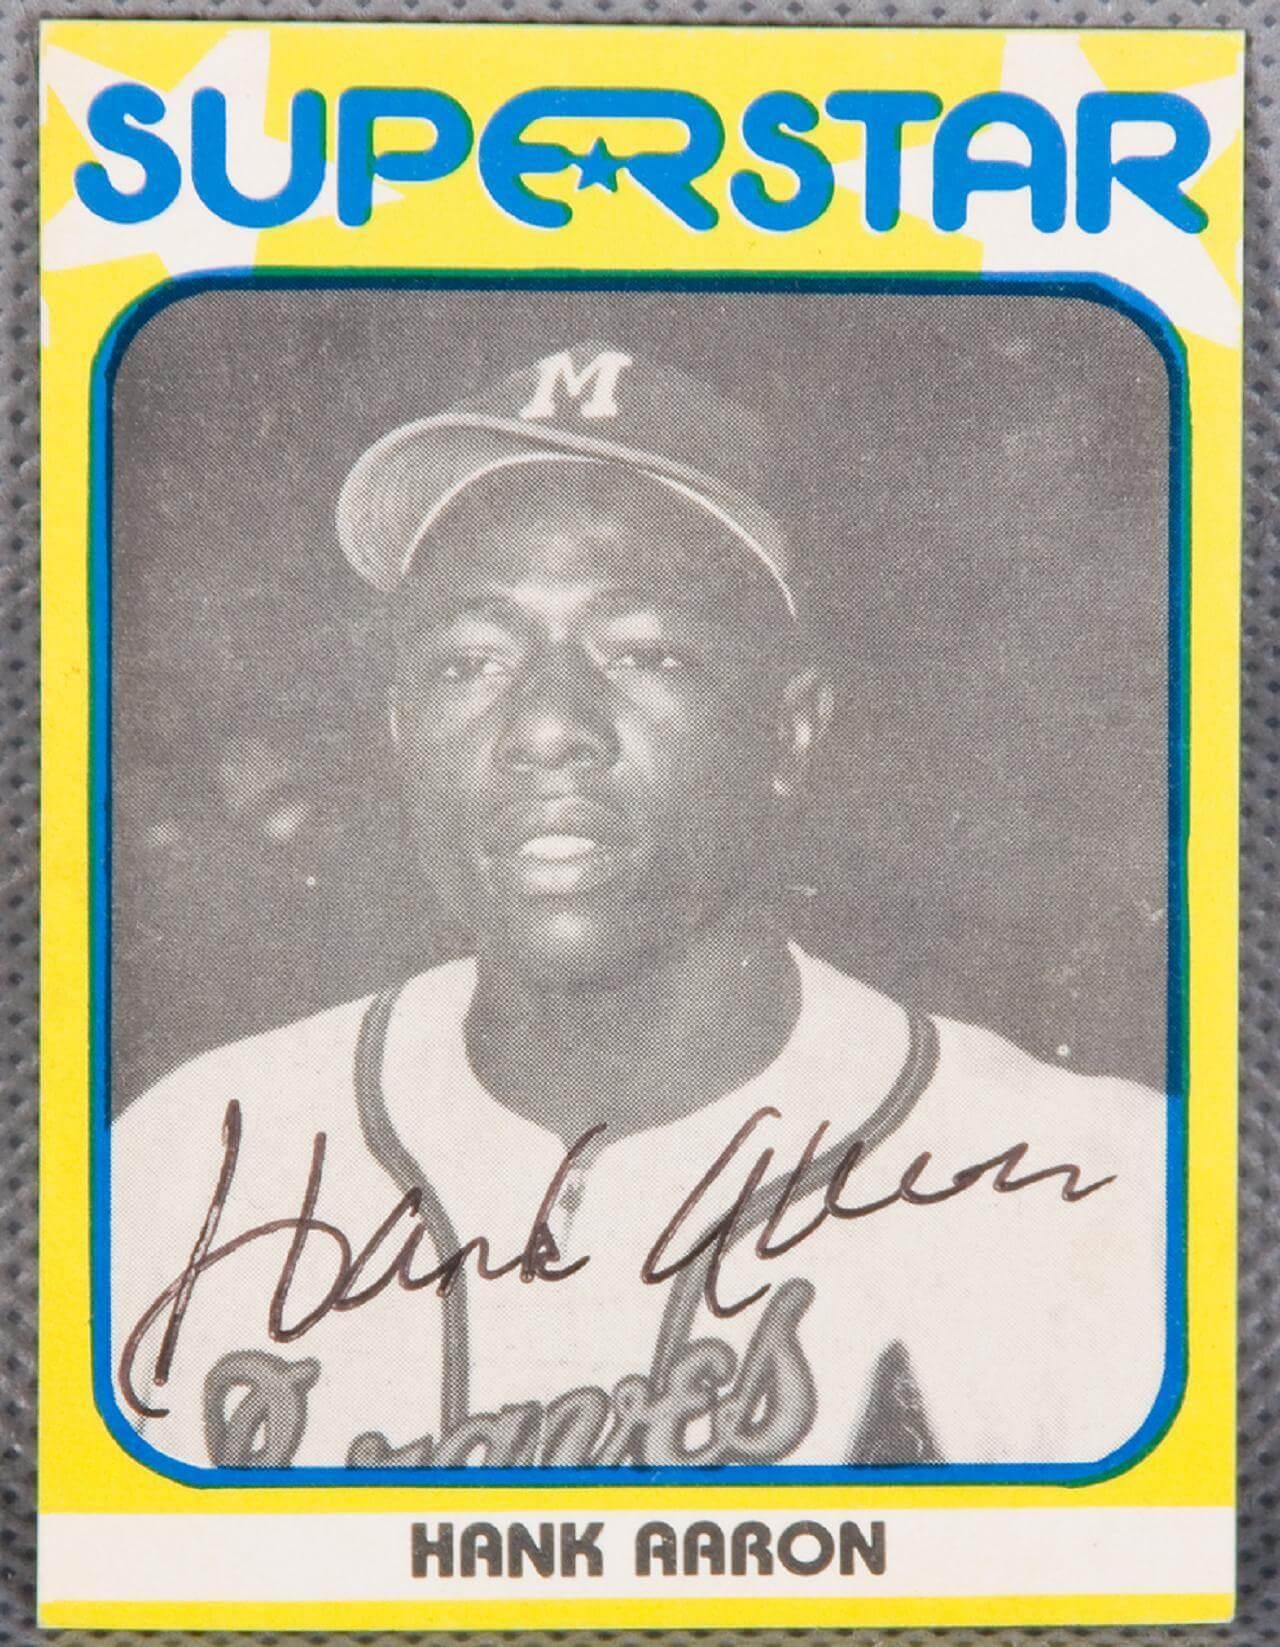 Hank Aaron Super Star Signed Card